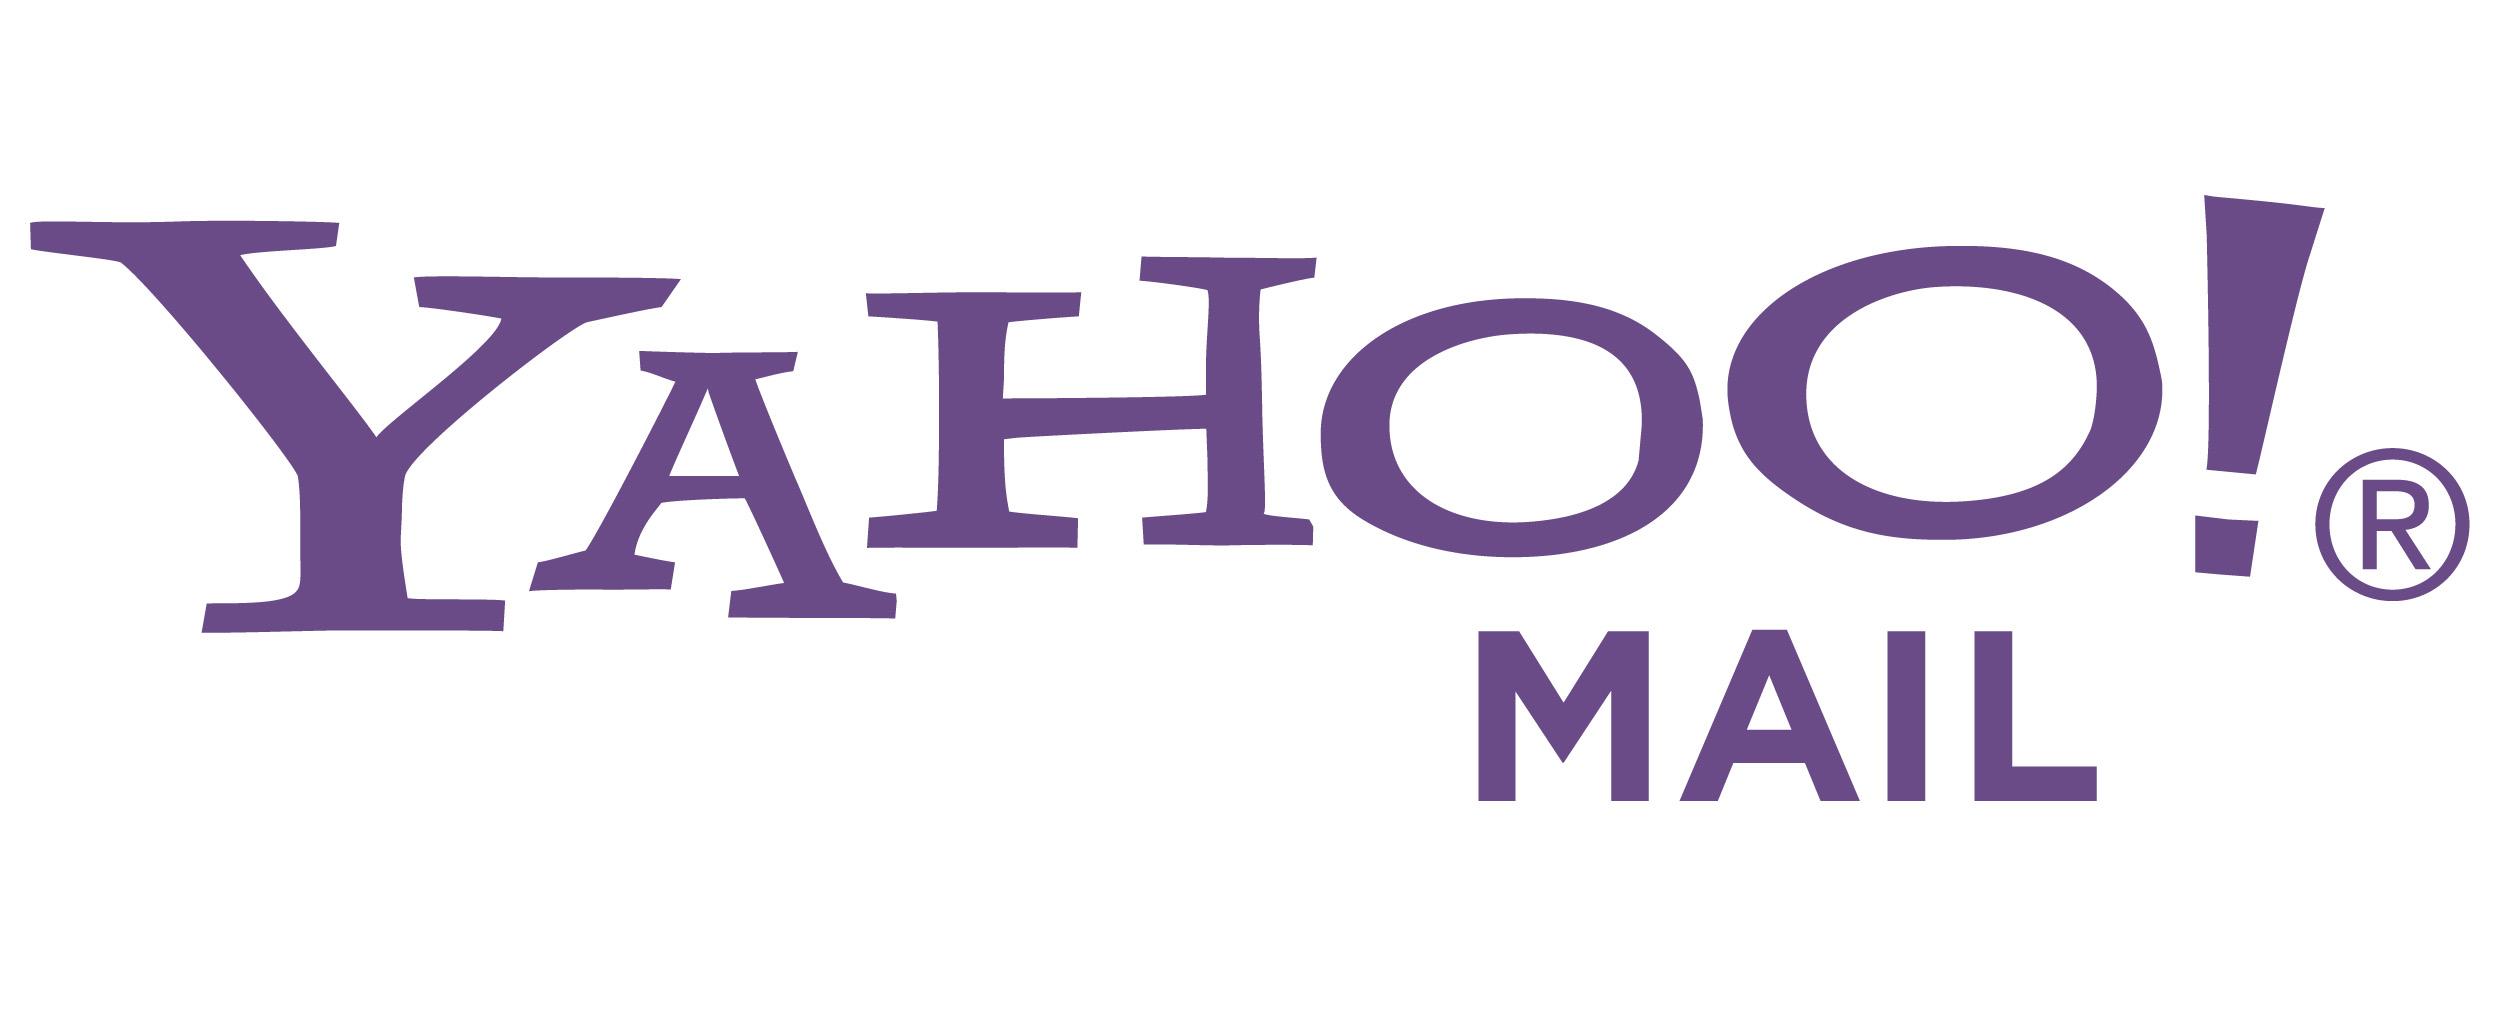 yahoo logo yahoo symbol meaning history and evolution